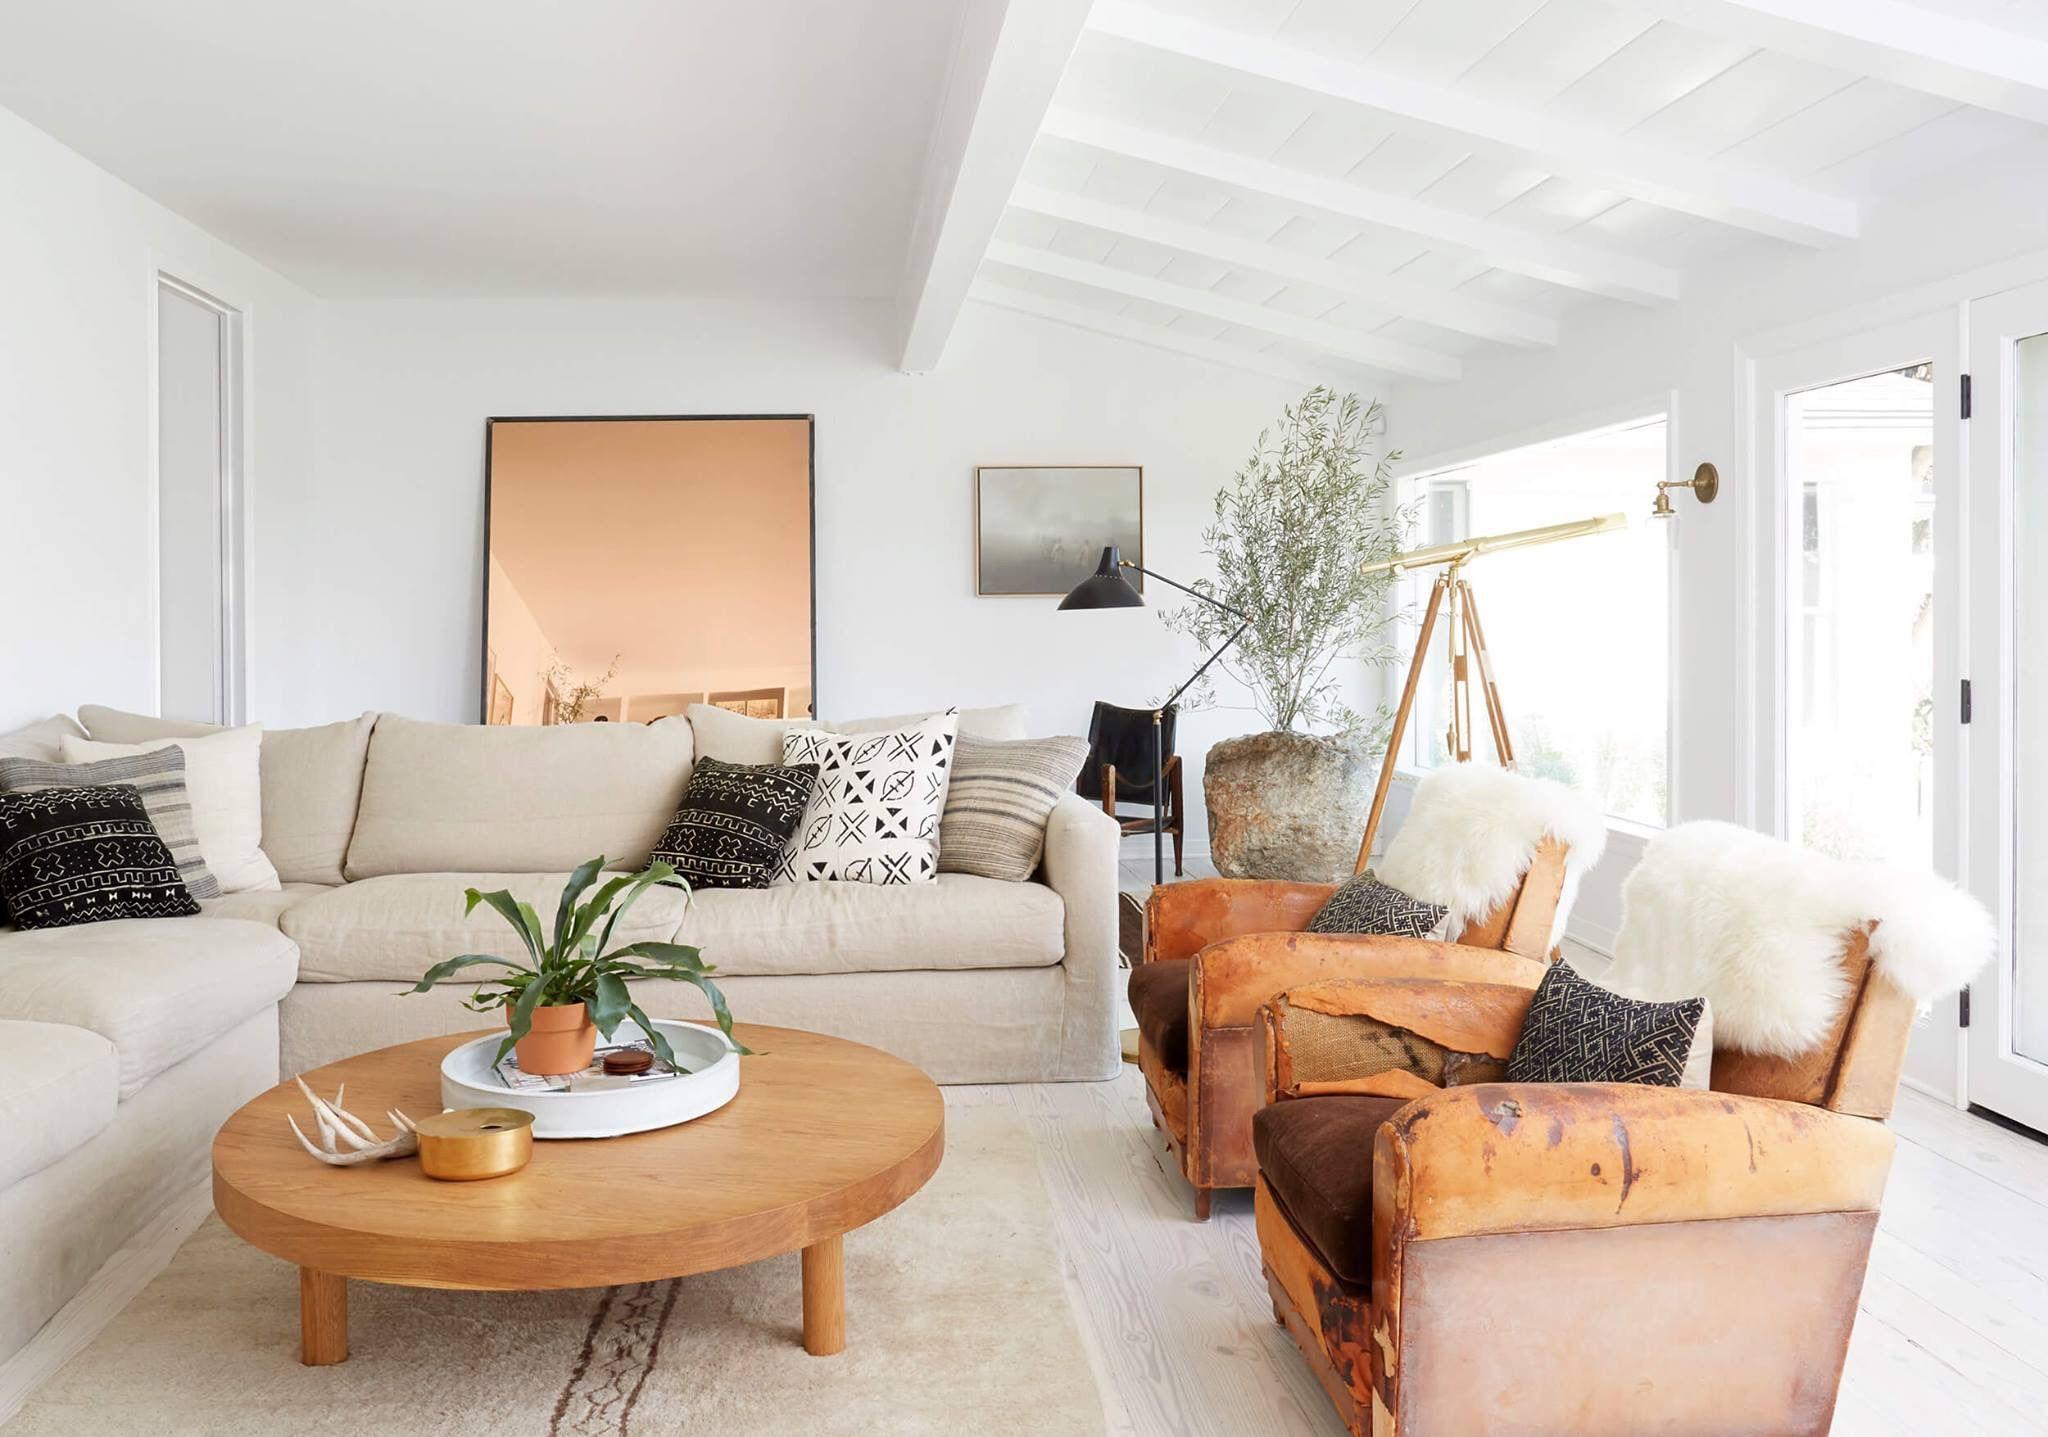 California casual living room | l i v i n g r o o m | Pinterest ...